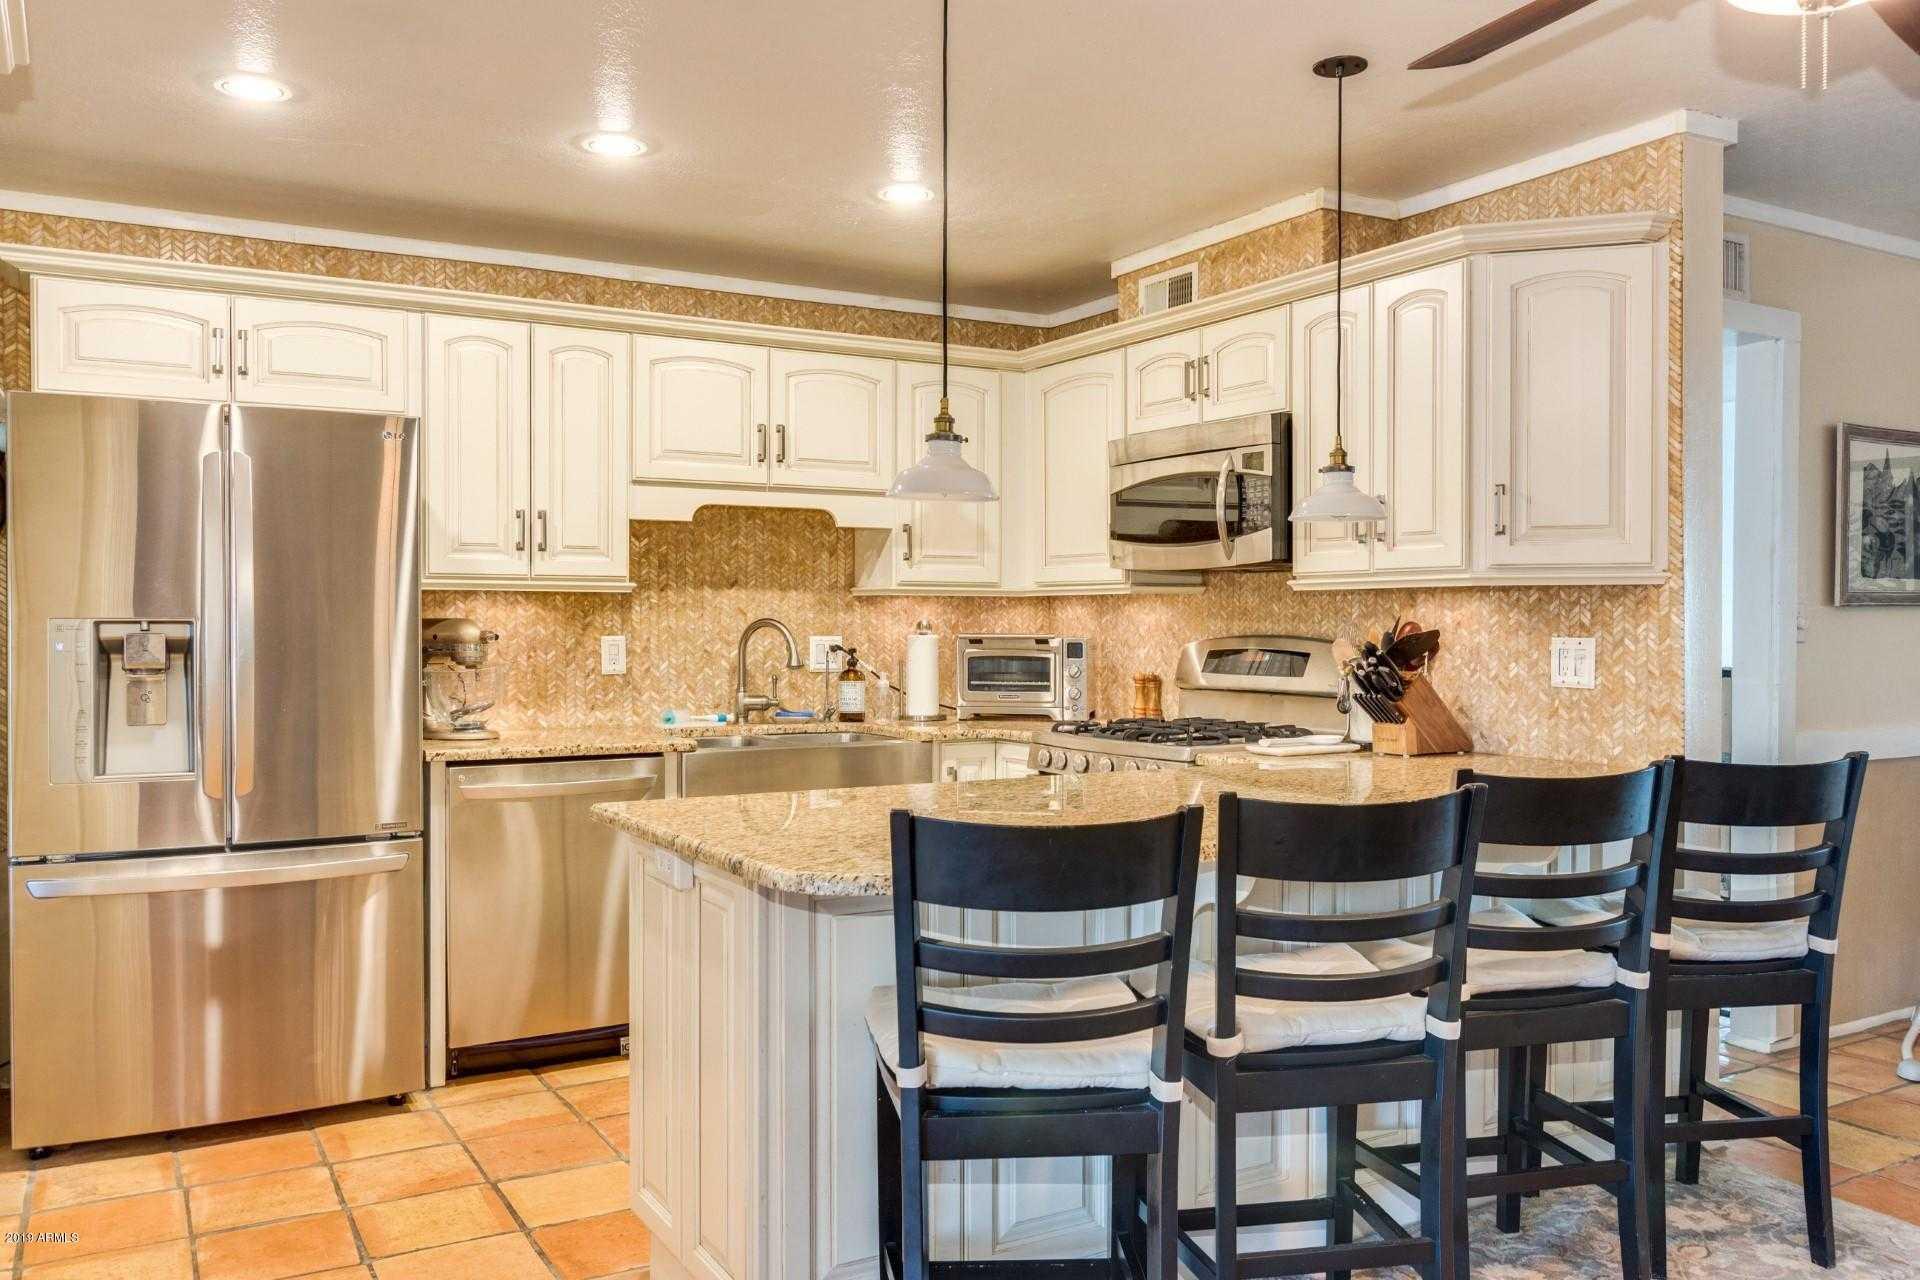 $400,000 - 3Br/2Ba - Home for Sale in Scottsdale Estates 7 Lots 760-887, Tr A, Scottsdale